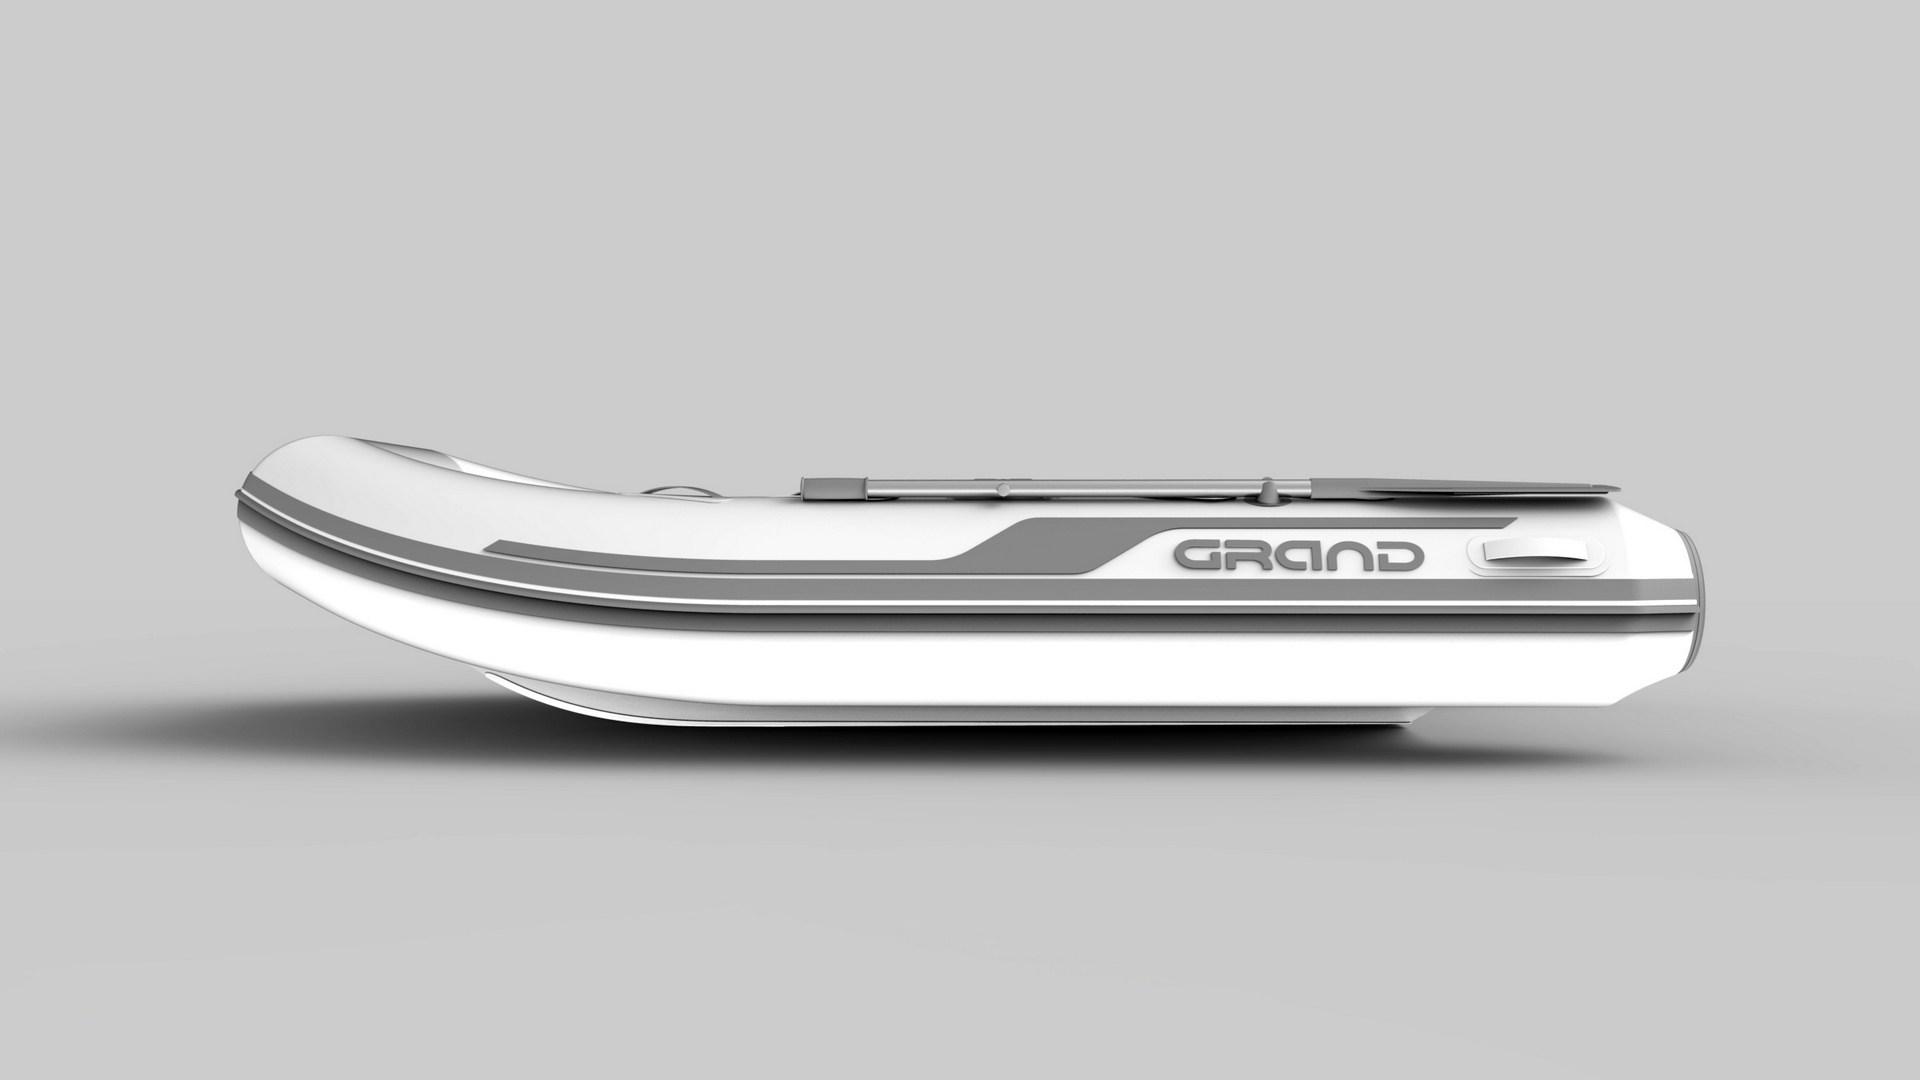 Надувная лодка с жестким алюминиевым дном GRAND Aluminum Line Alu300D,  Надувная лодка GRAND Aluminum Line Alu300D, GRAND Aluminum Line Alu300D, GRAND Alu300D, Надувная лодка GRAND, Надувная лодка ГРАНД, Надувная лодка с жестким дном, RIB, Rigid Inflatable Boats